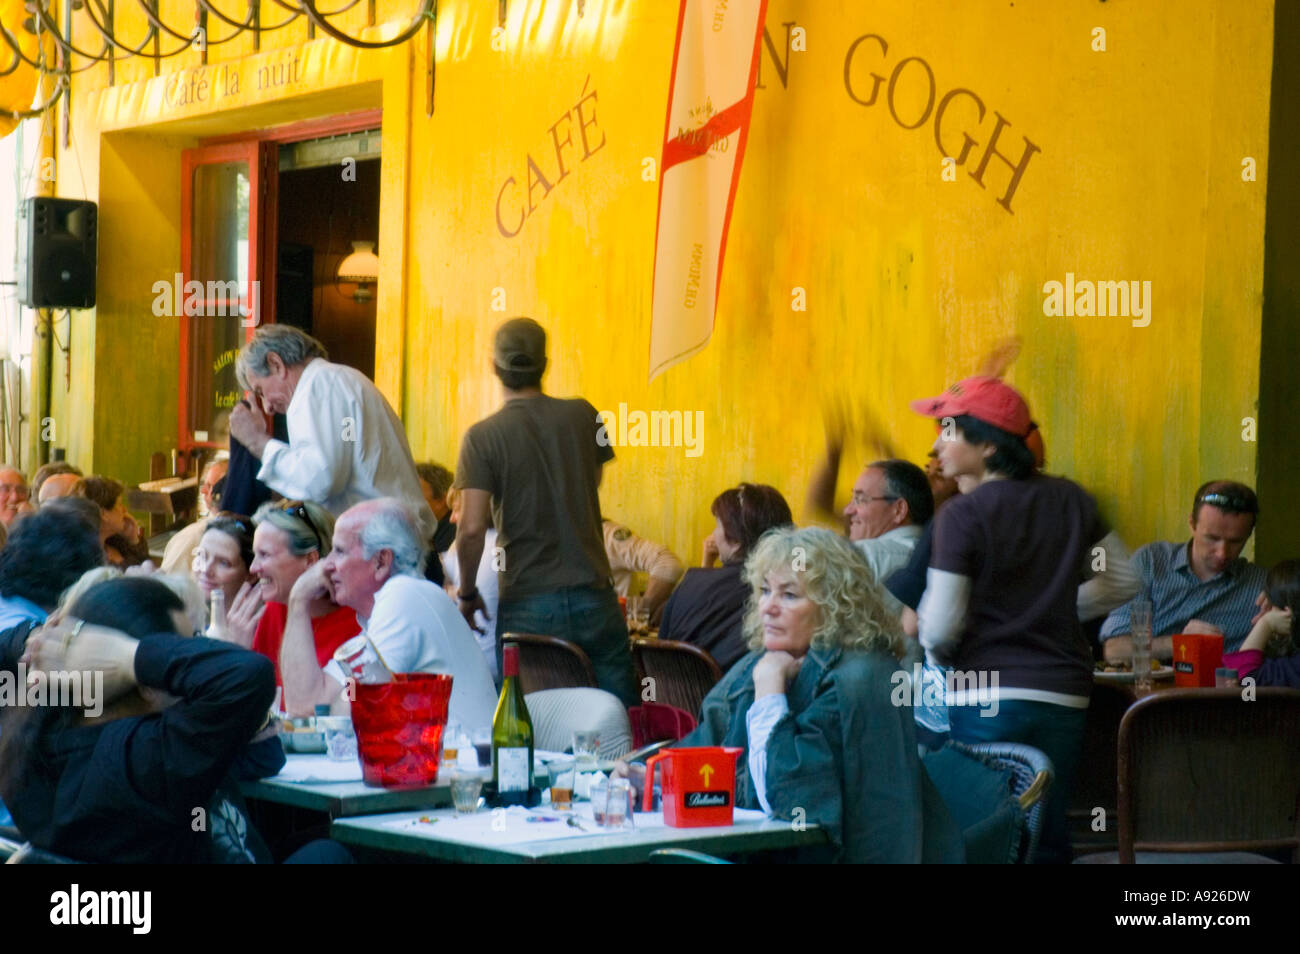 Arles Cafe Van Gogh Stockfotos Arles Cafe Van Gogh Bilder Seite